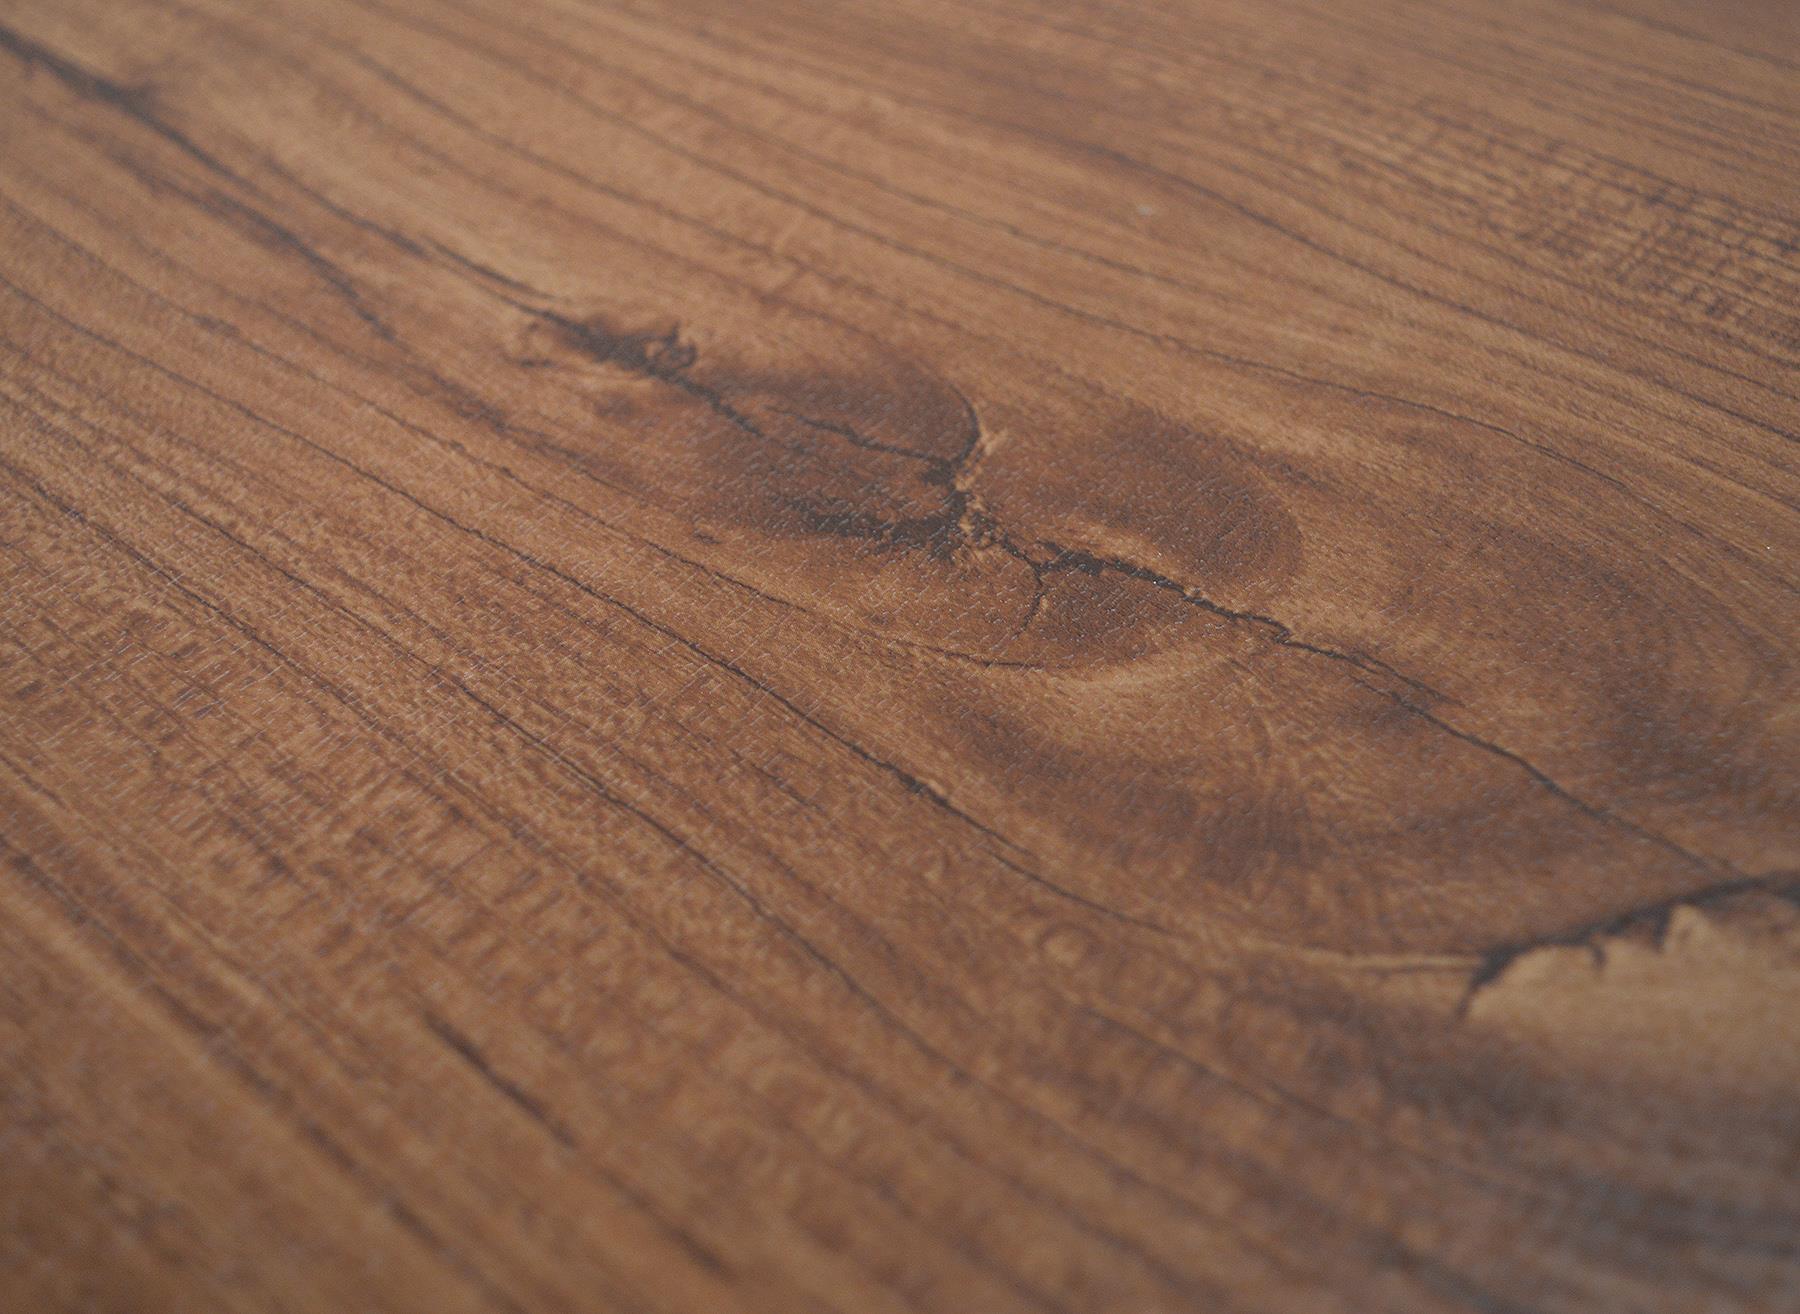 Floor-Tiles-Self-Adhesive-Vinyl-Flooring-Kitchen-Bathroom-Brown-Wood-Grain thumbnail 13